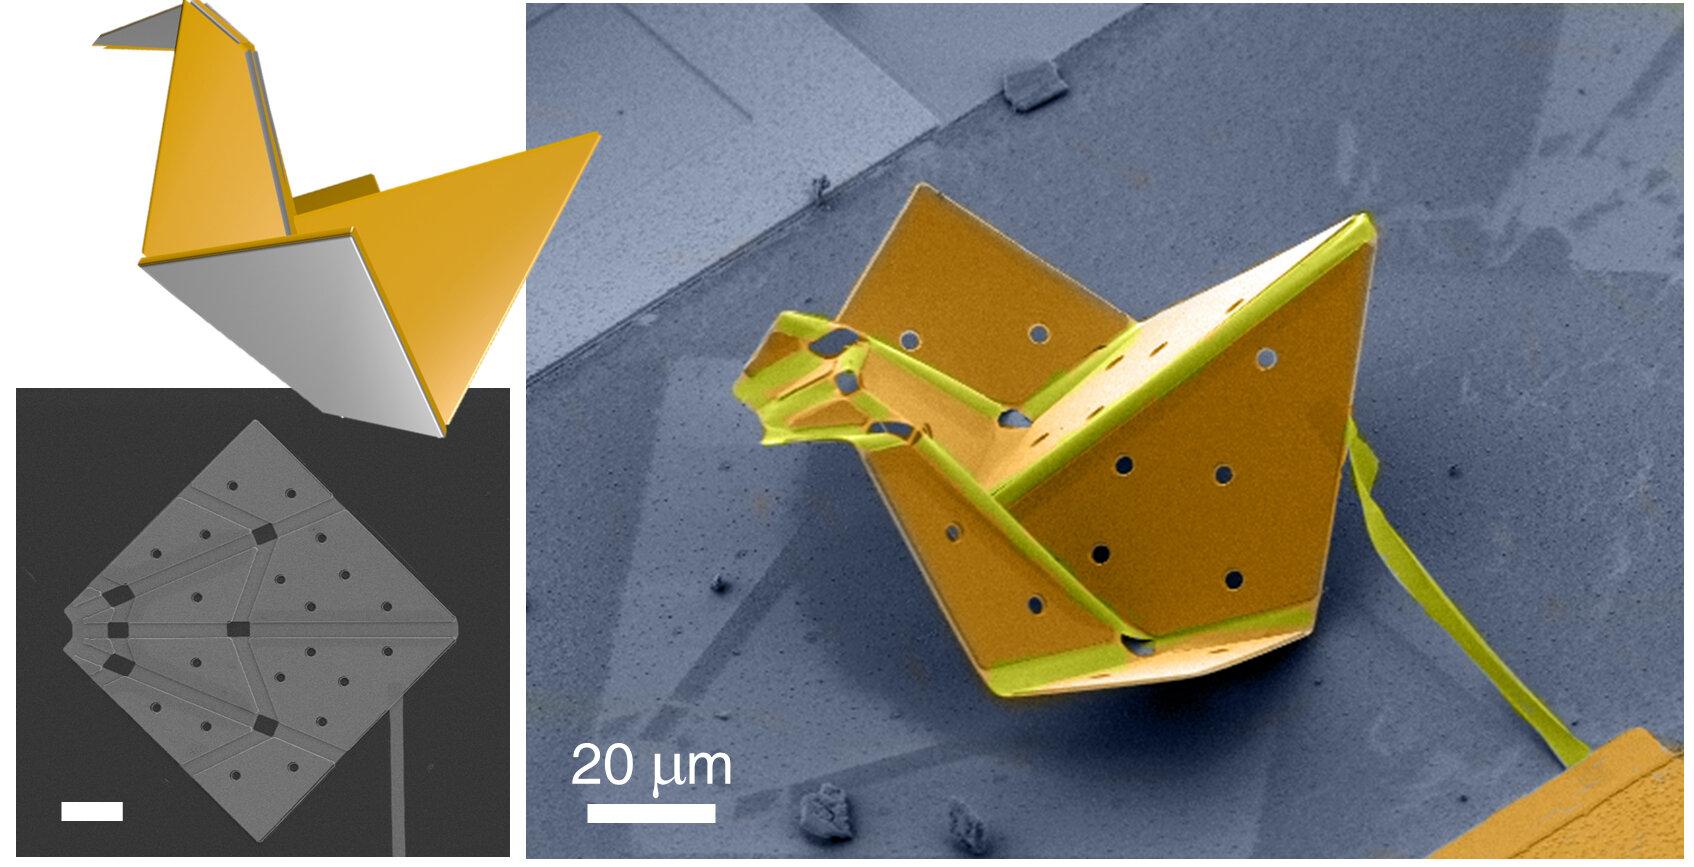 Nanotech scientists create world's smallest origami bird